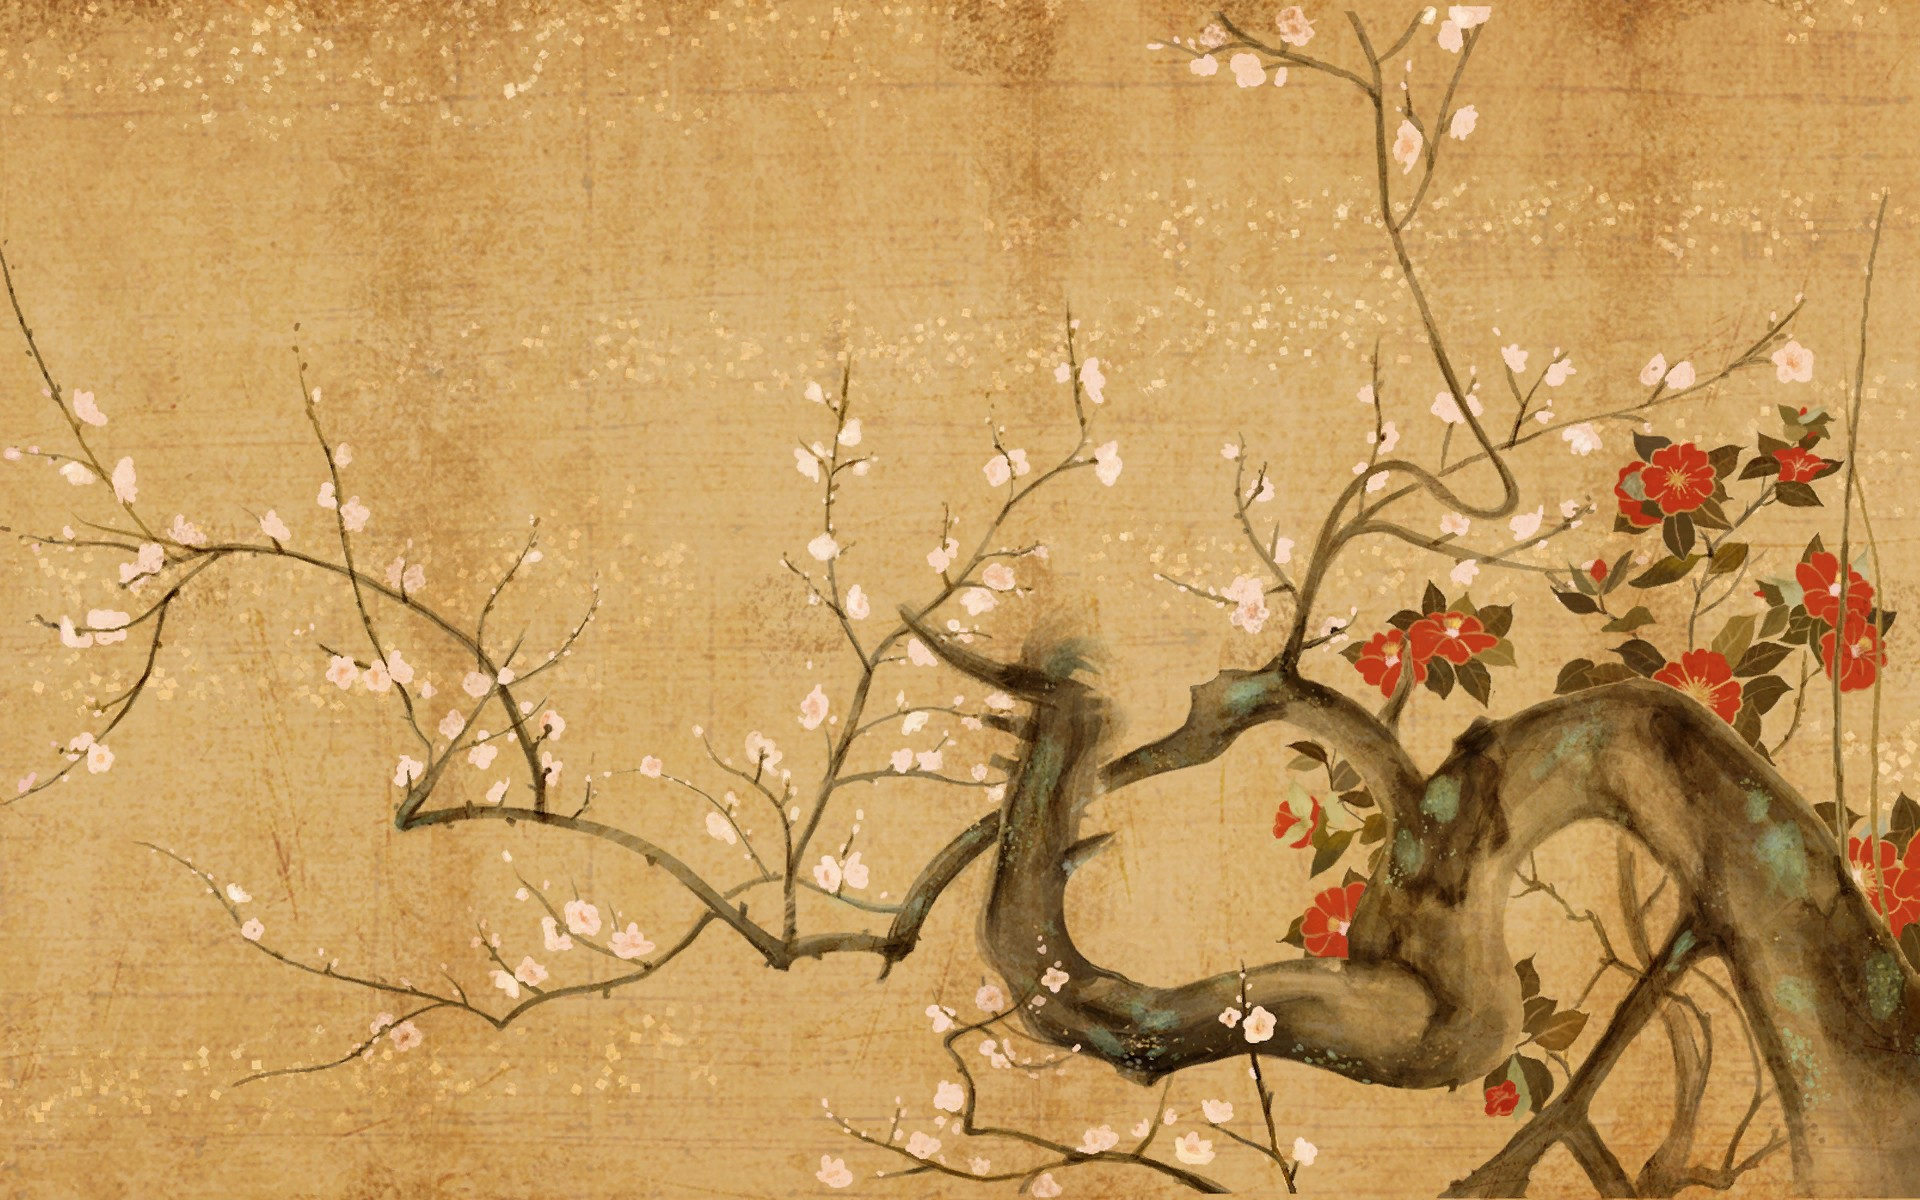 japan japanese shogun shogun 2 total war wallpaper | 1920x1200